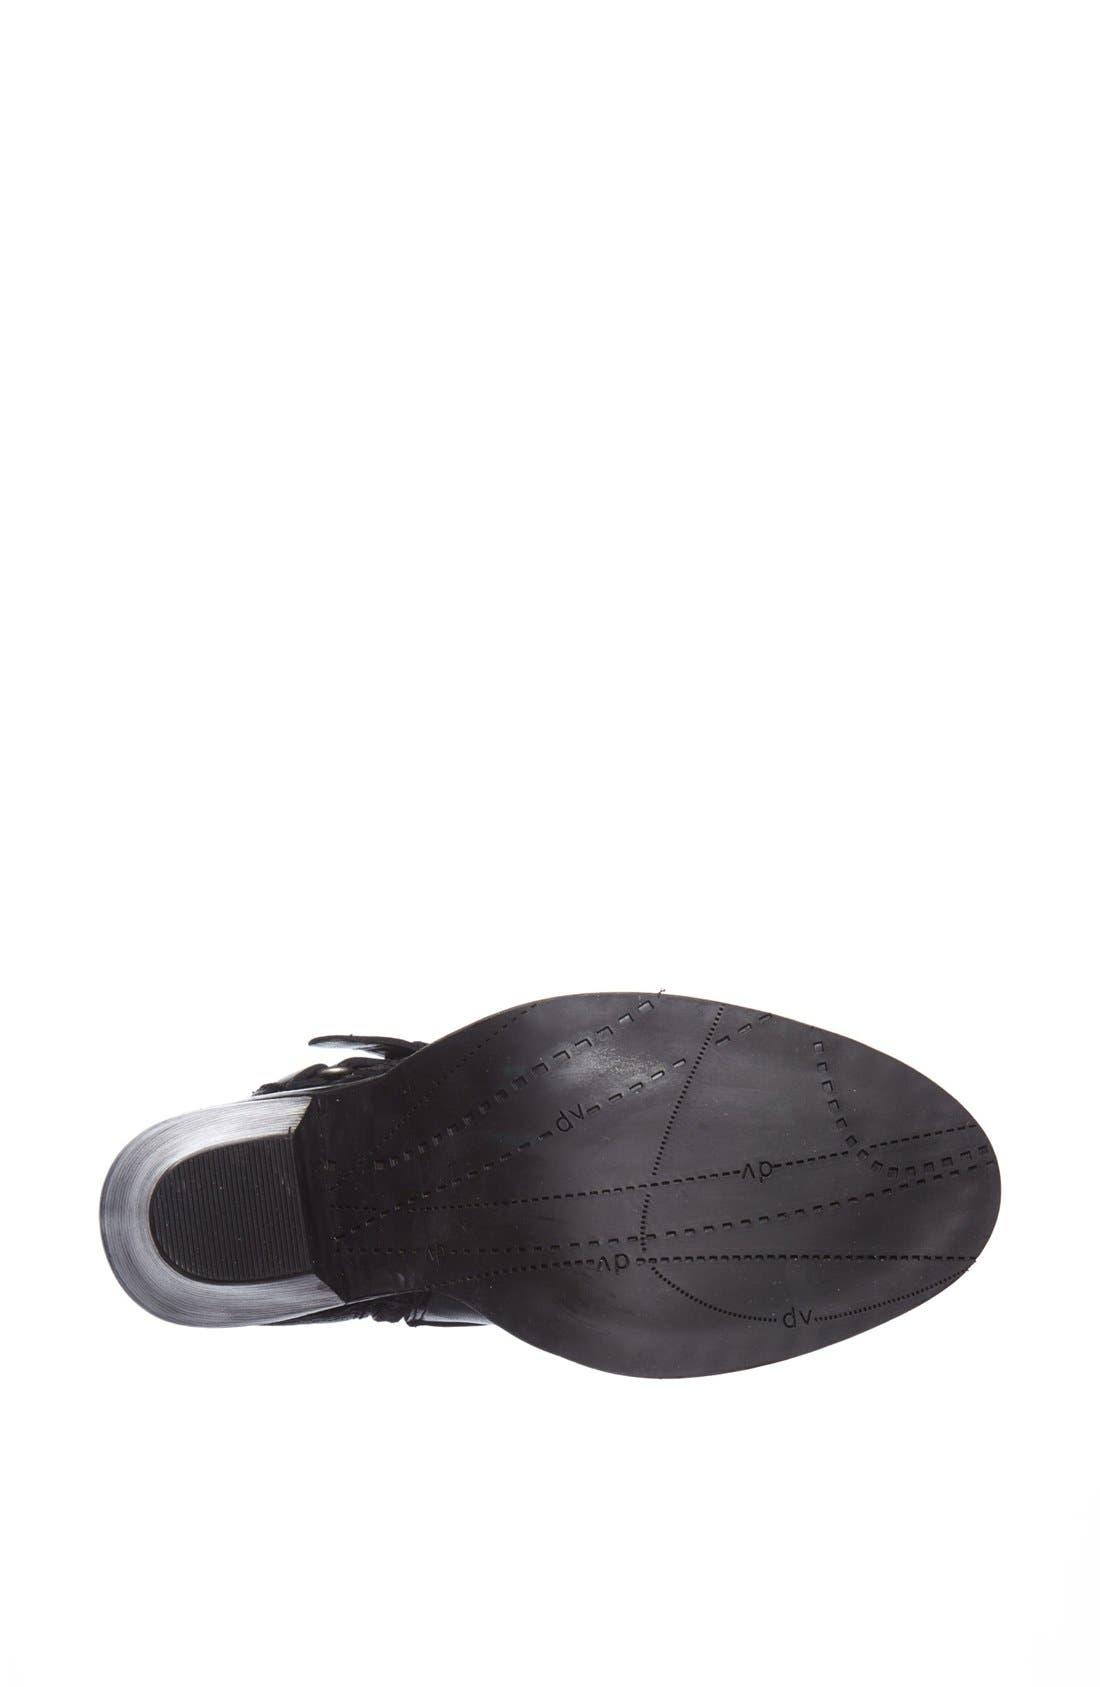 'Christie' Boot,                             Alternate thumbnail 4, color,                             001